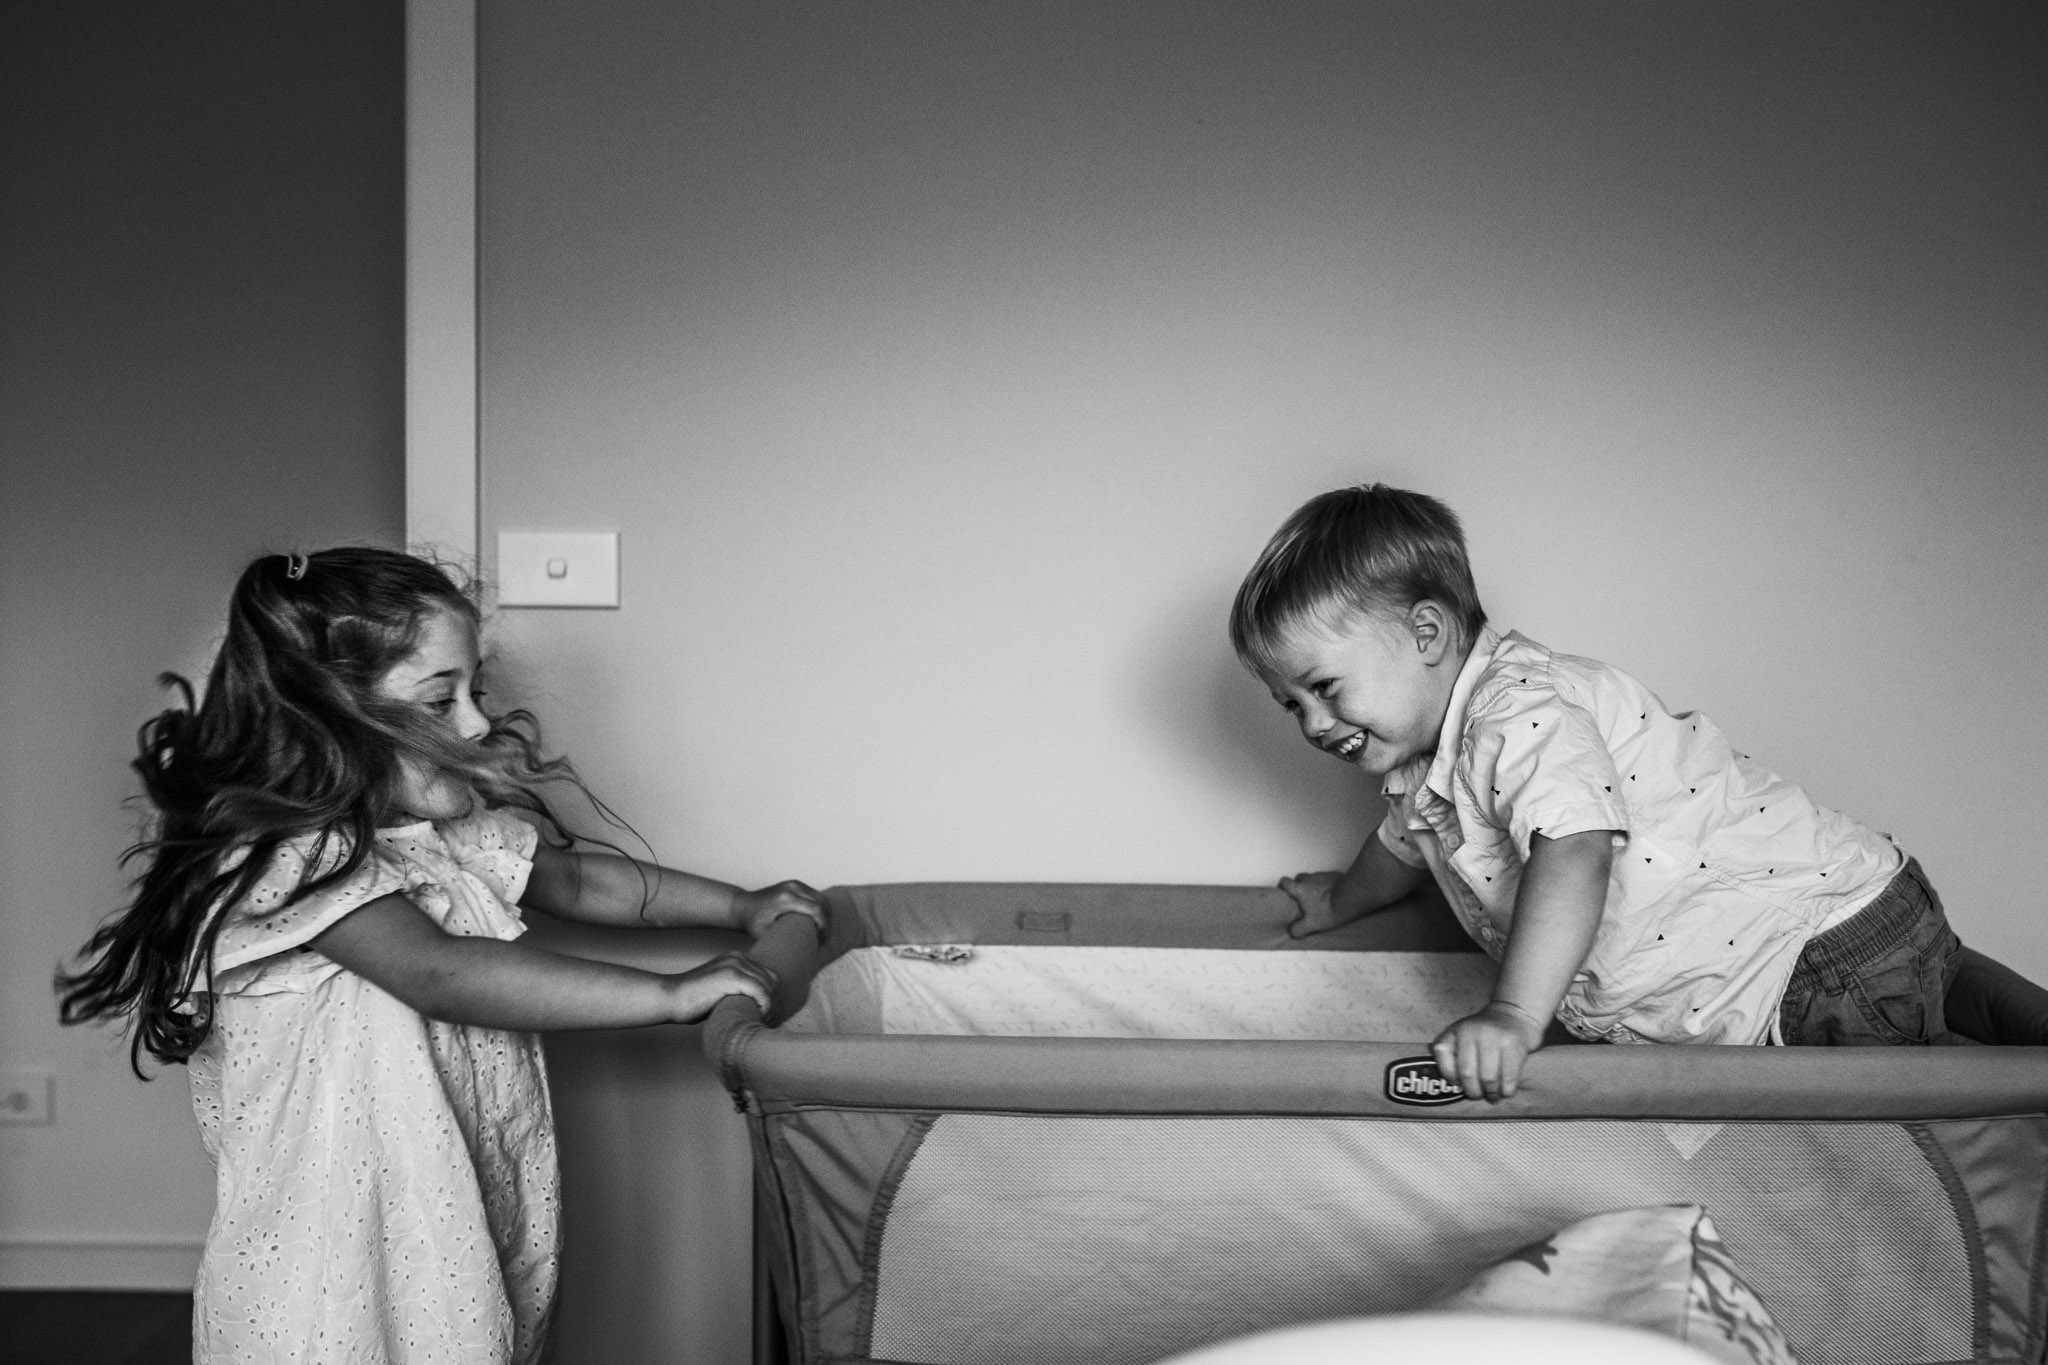 children-playing-in-baby-bassinet (1 of 1).jpg